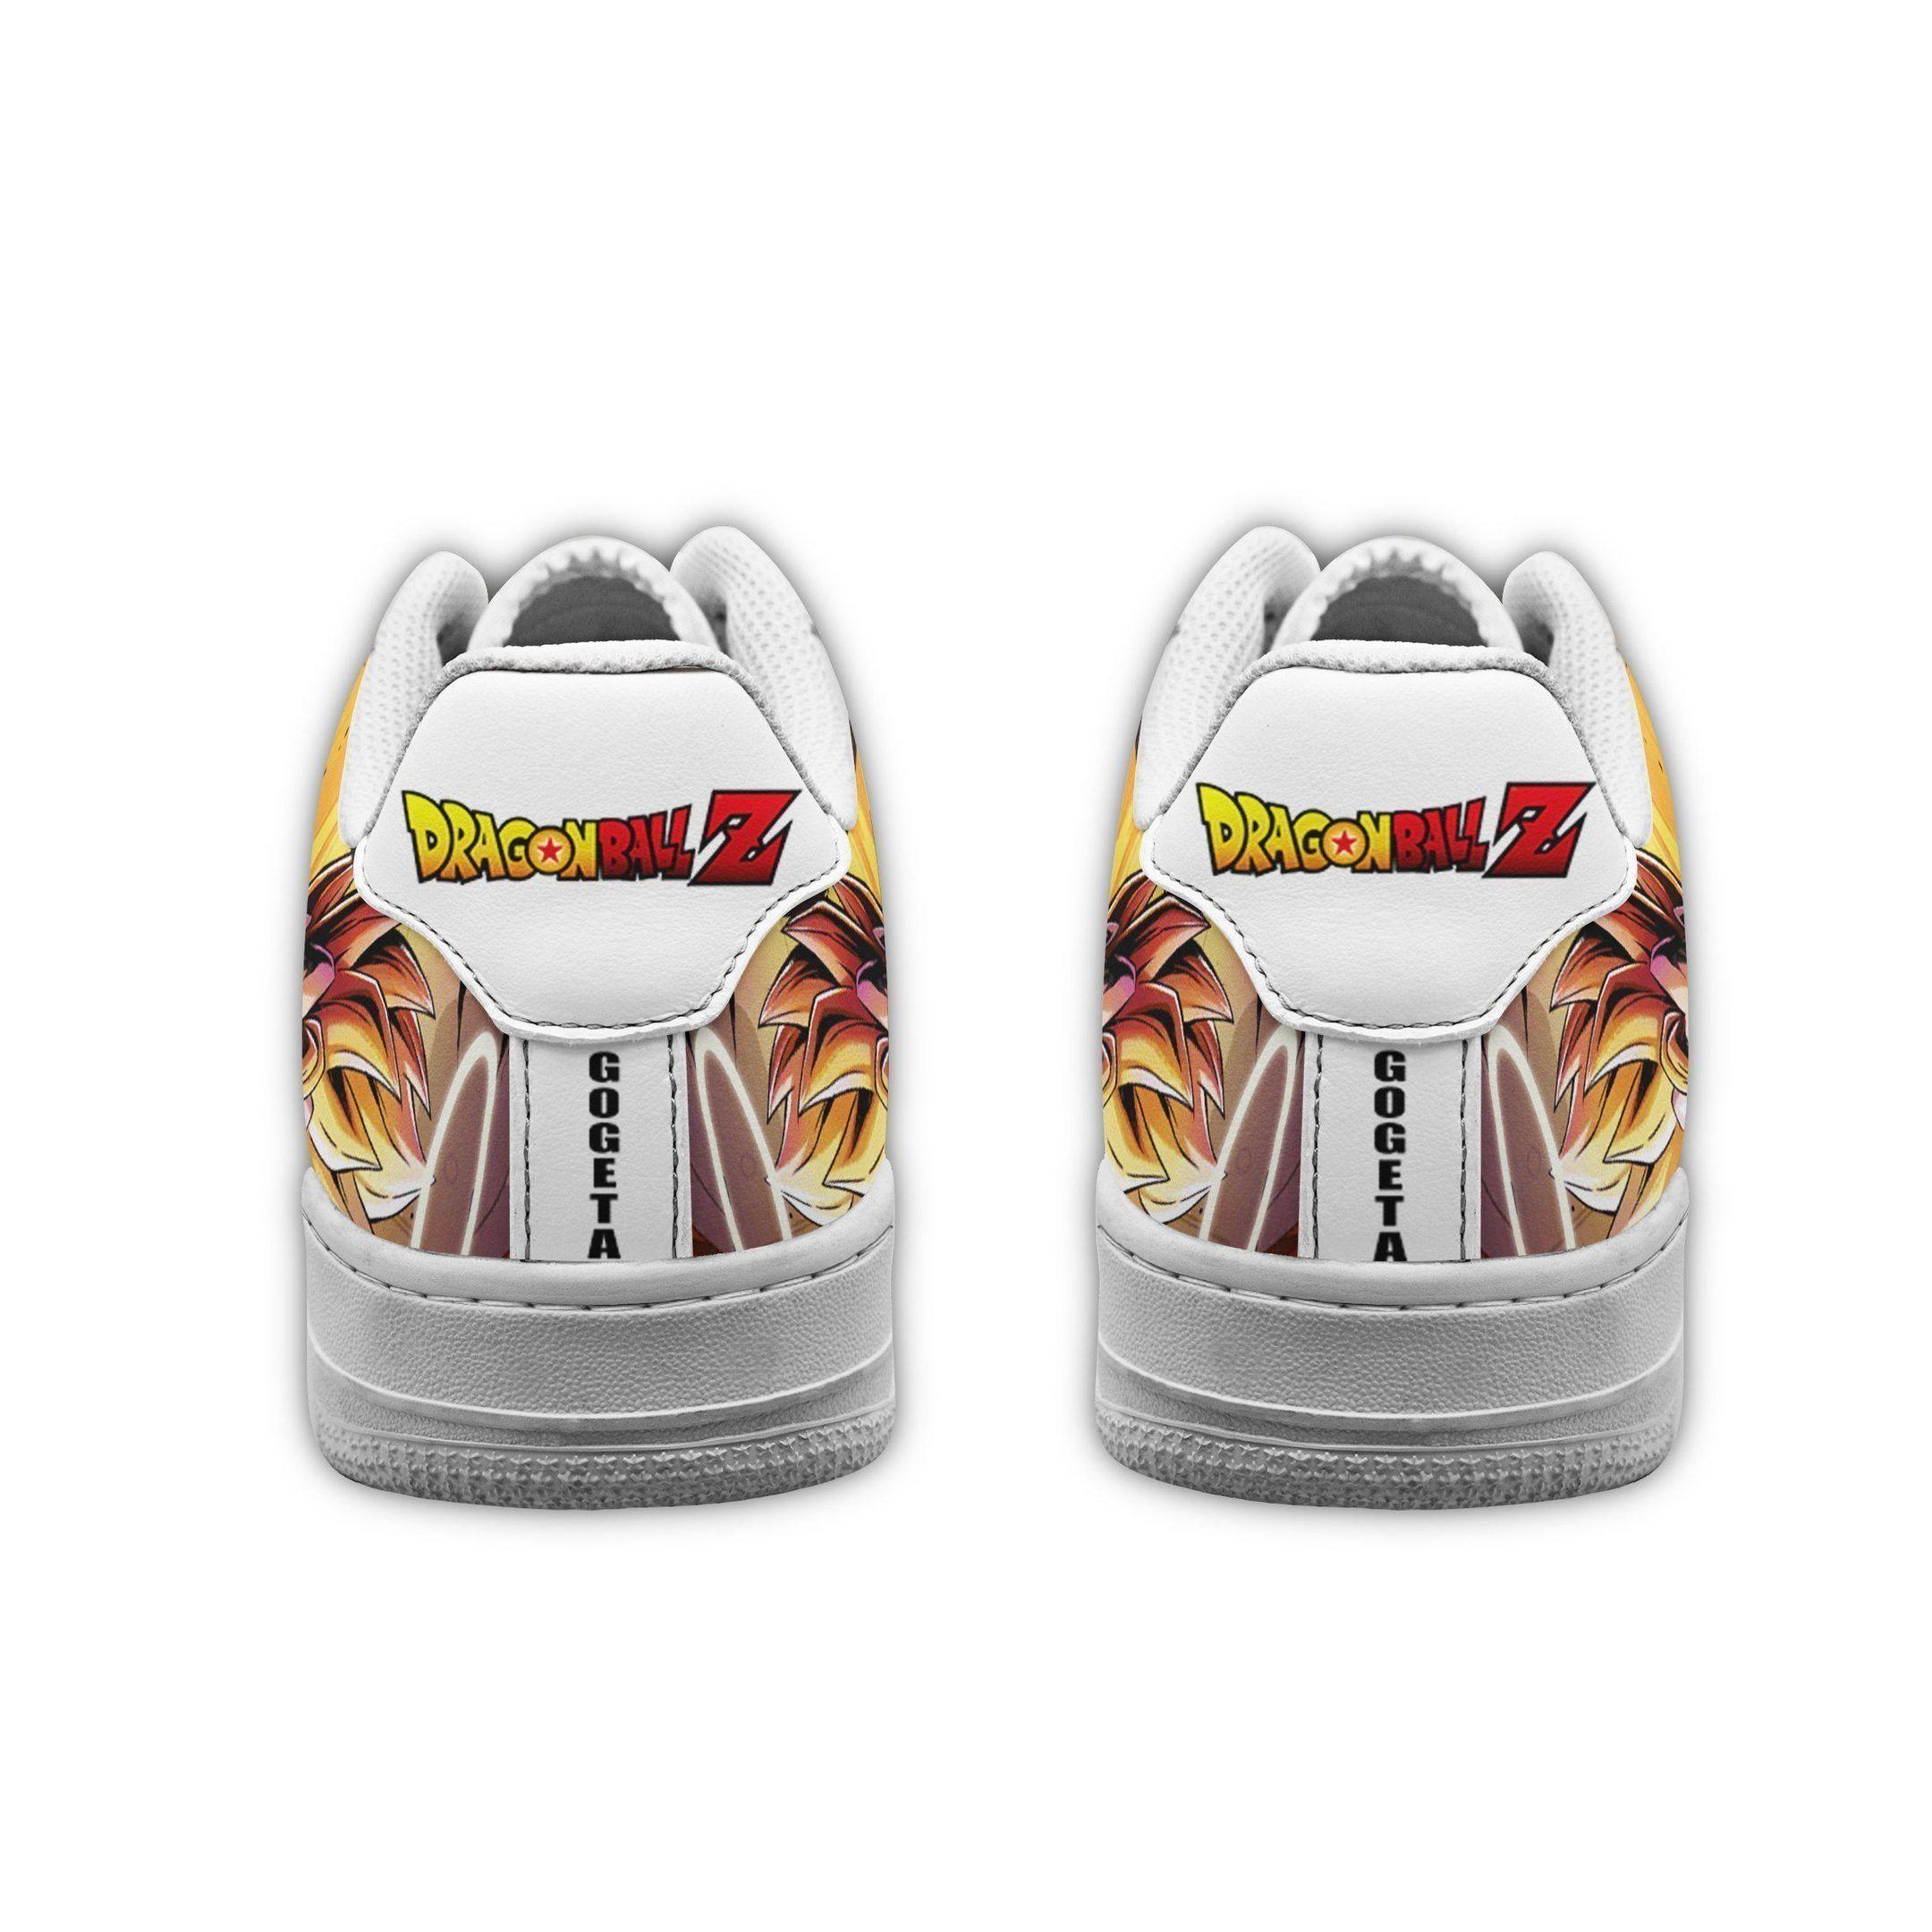 Gogeta Air Shoes Dragon Ball Z Anime Shoes Fan Gift GO1012